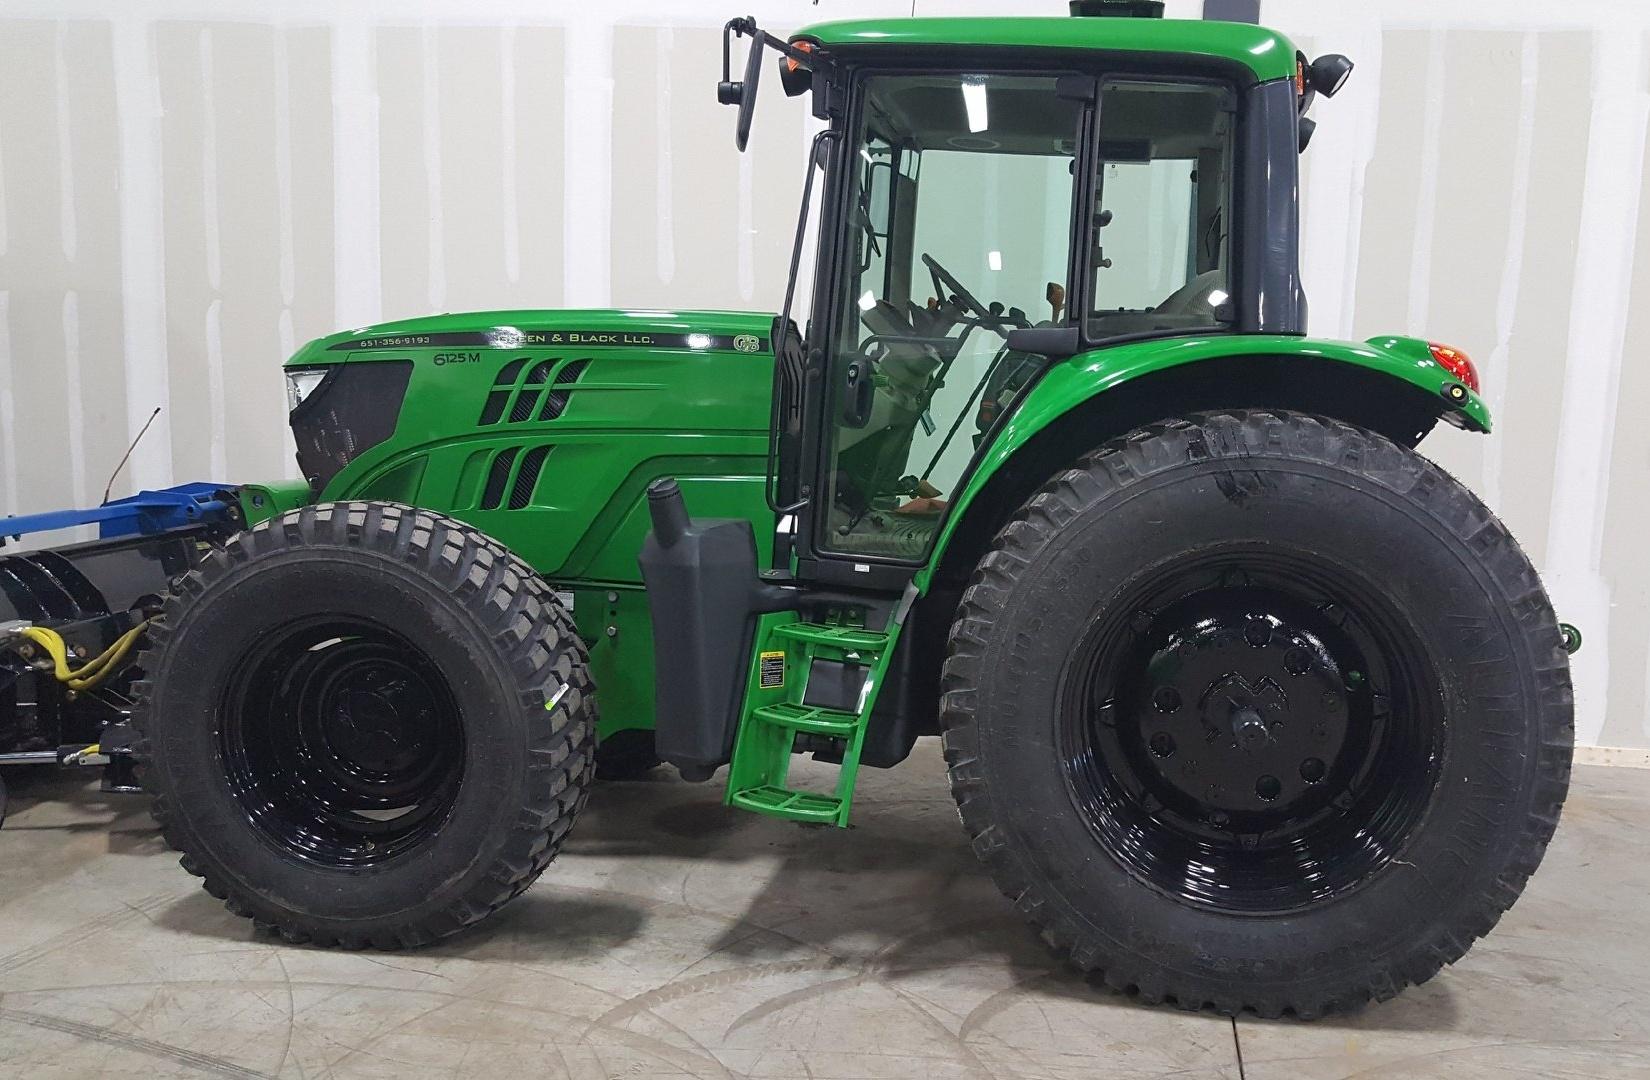 jd green machine-1-968022-edited